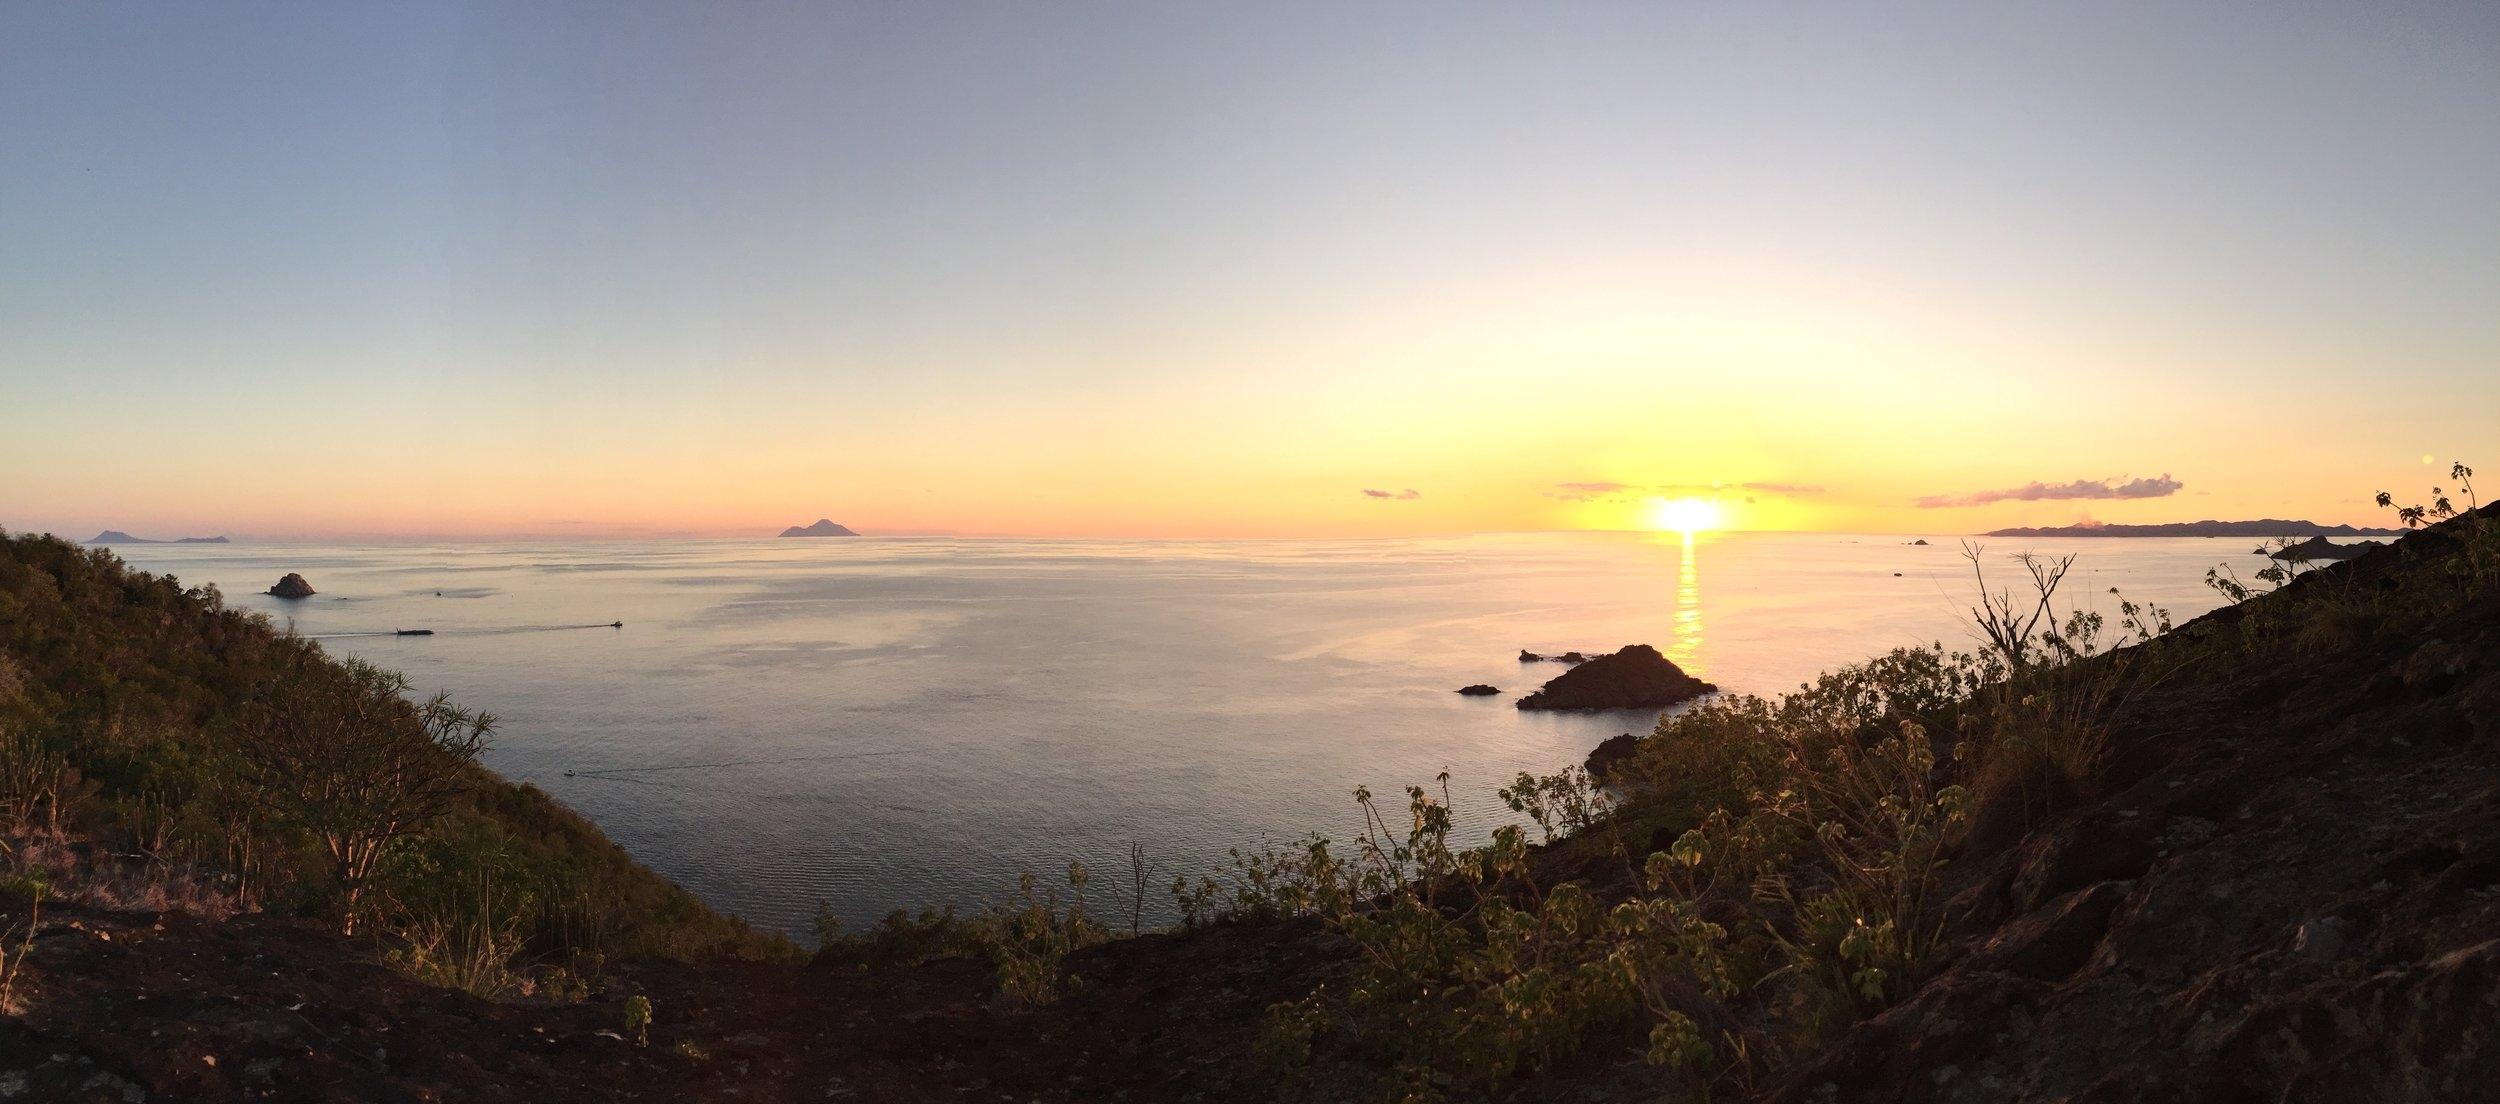 sunset-st-barth-france-gustavia-port.jpg